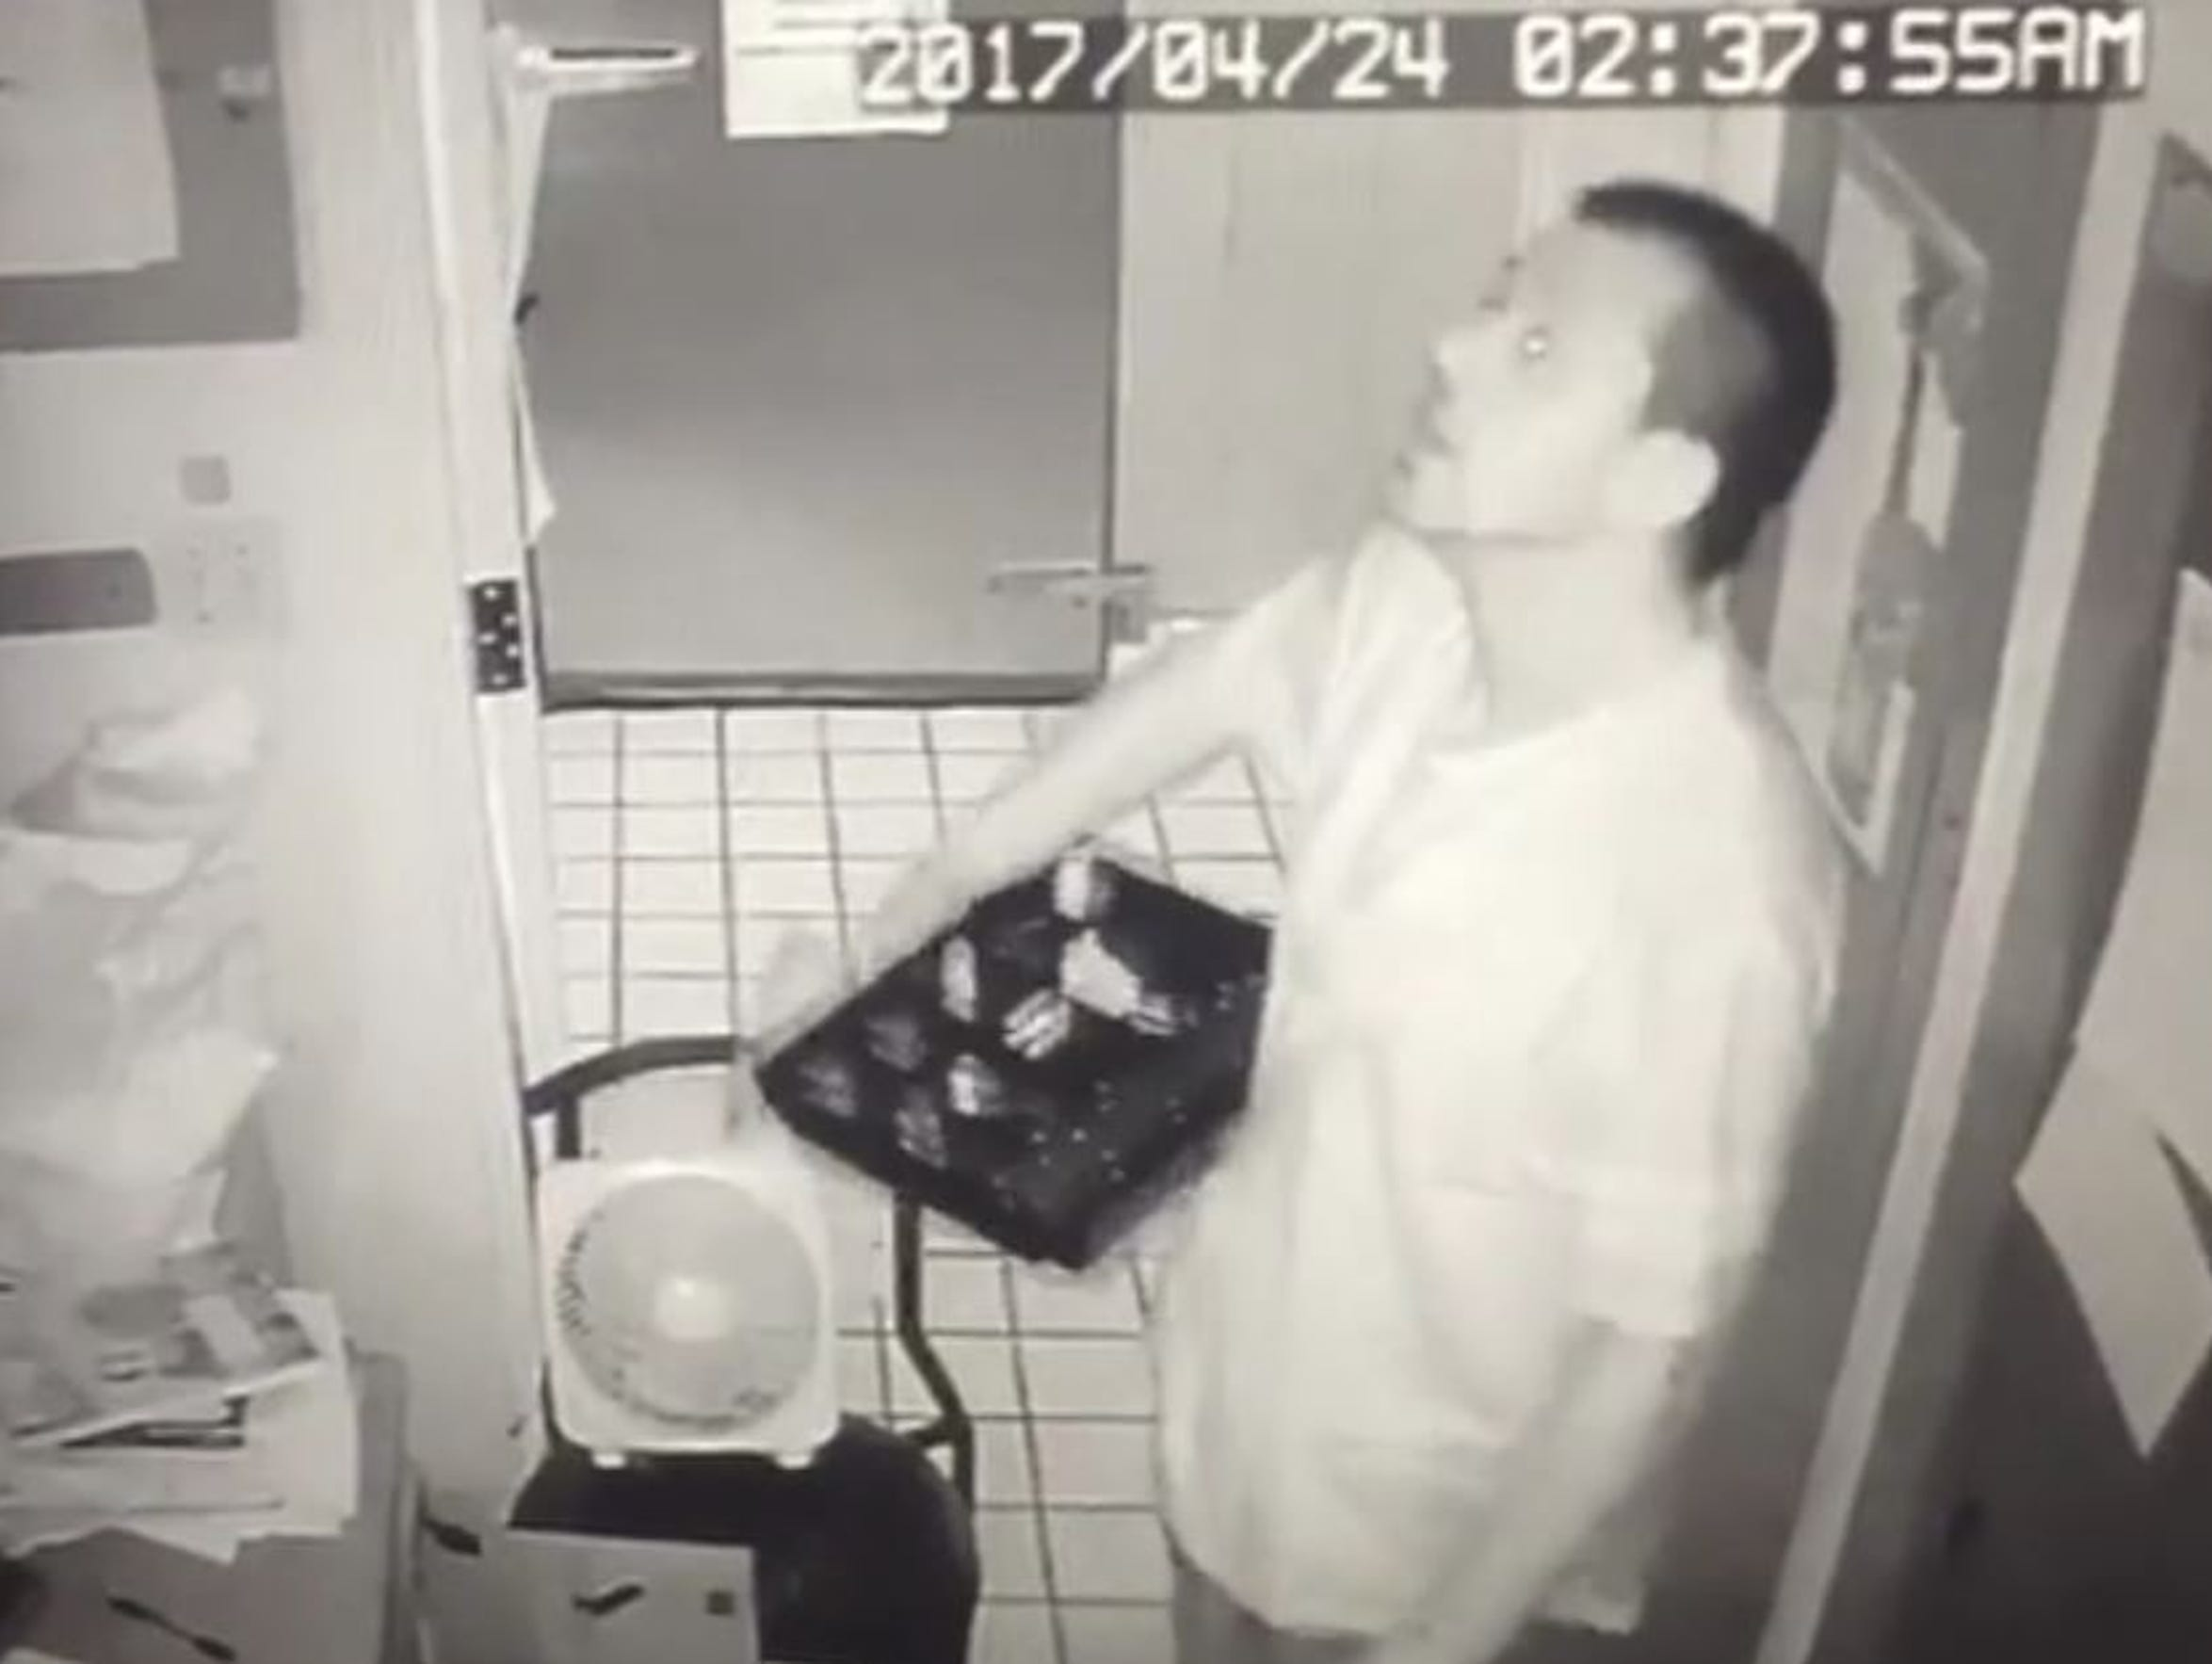 A burglar, identified by police as former Oscar's employee